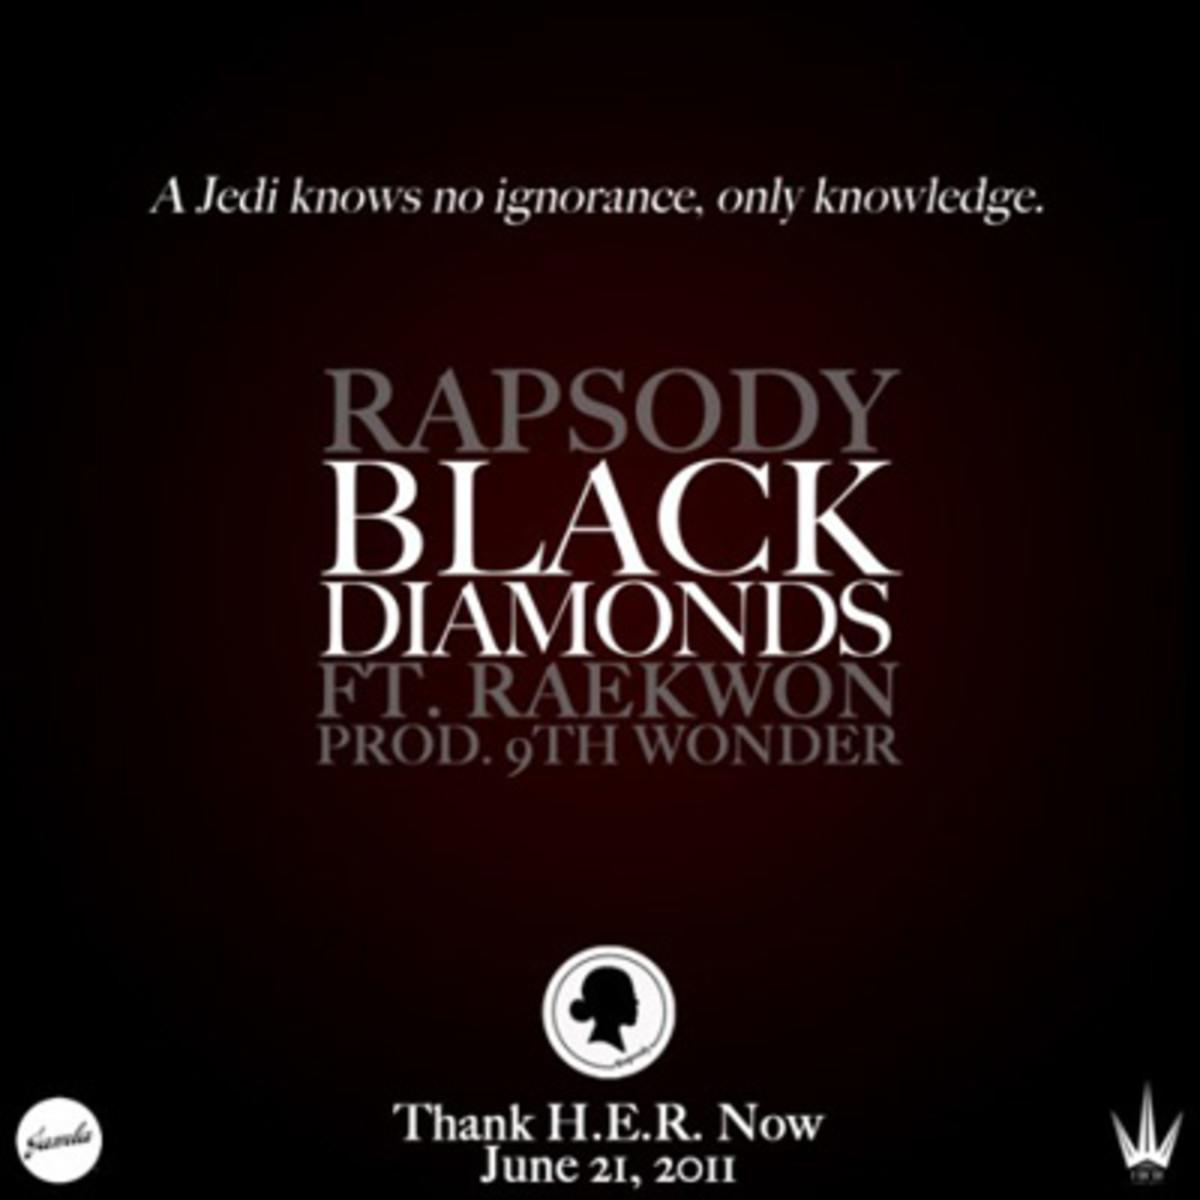 rapsody-blackdiamonds.jpg